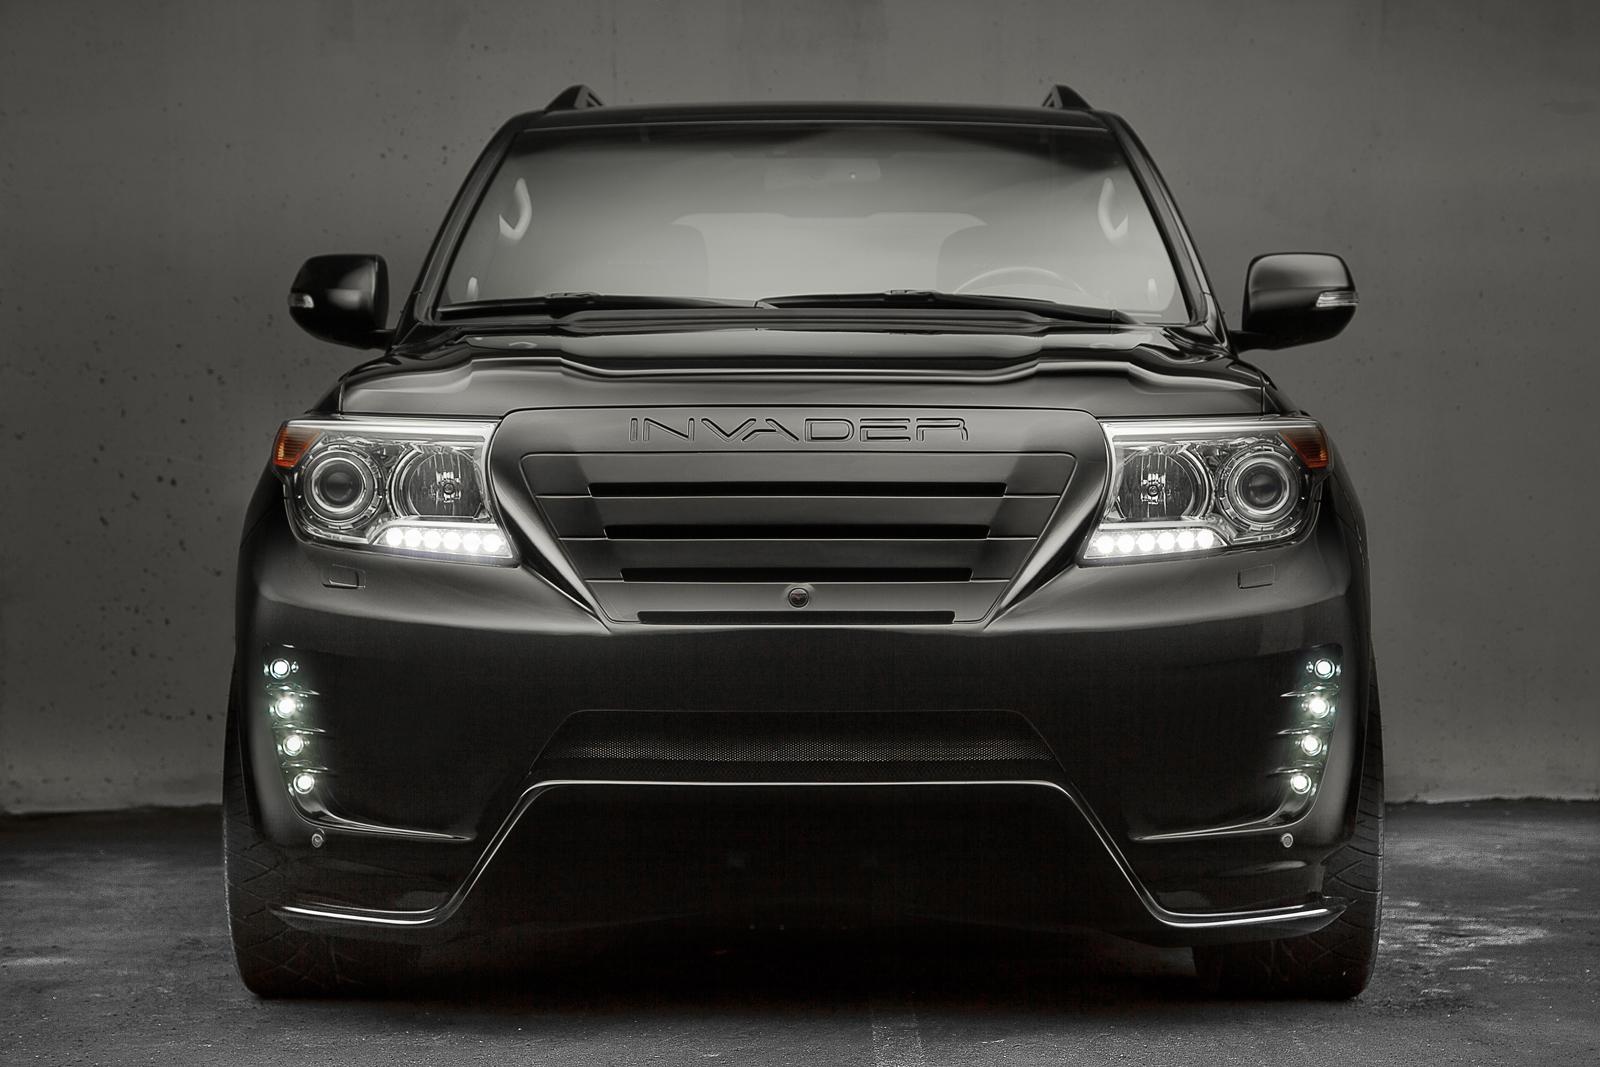 Custom Toyota Land Cruiser Looks Vicious - autoevolution